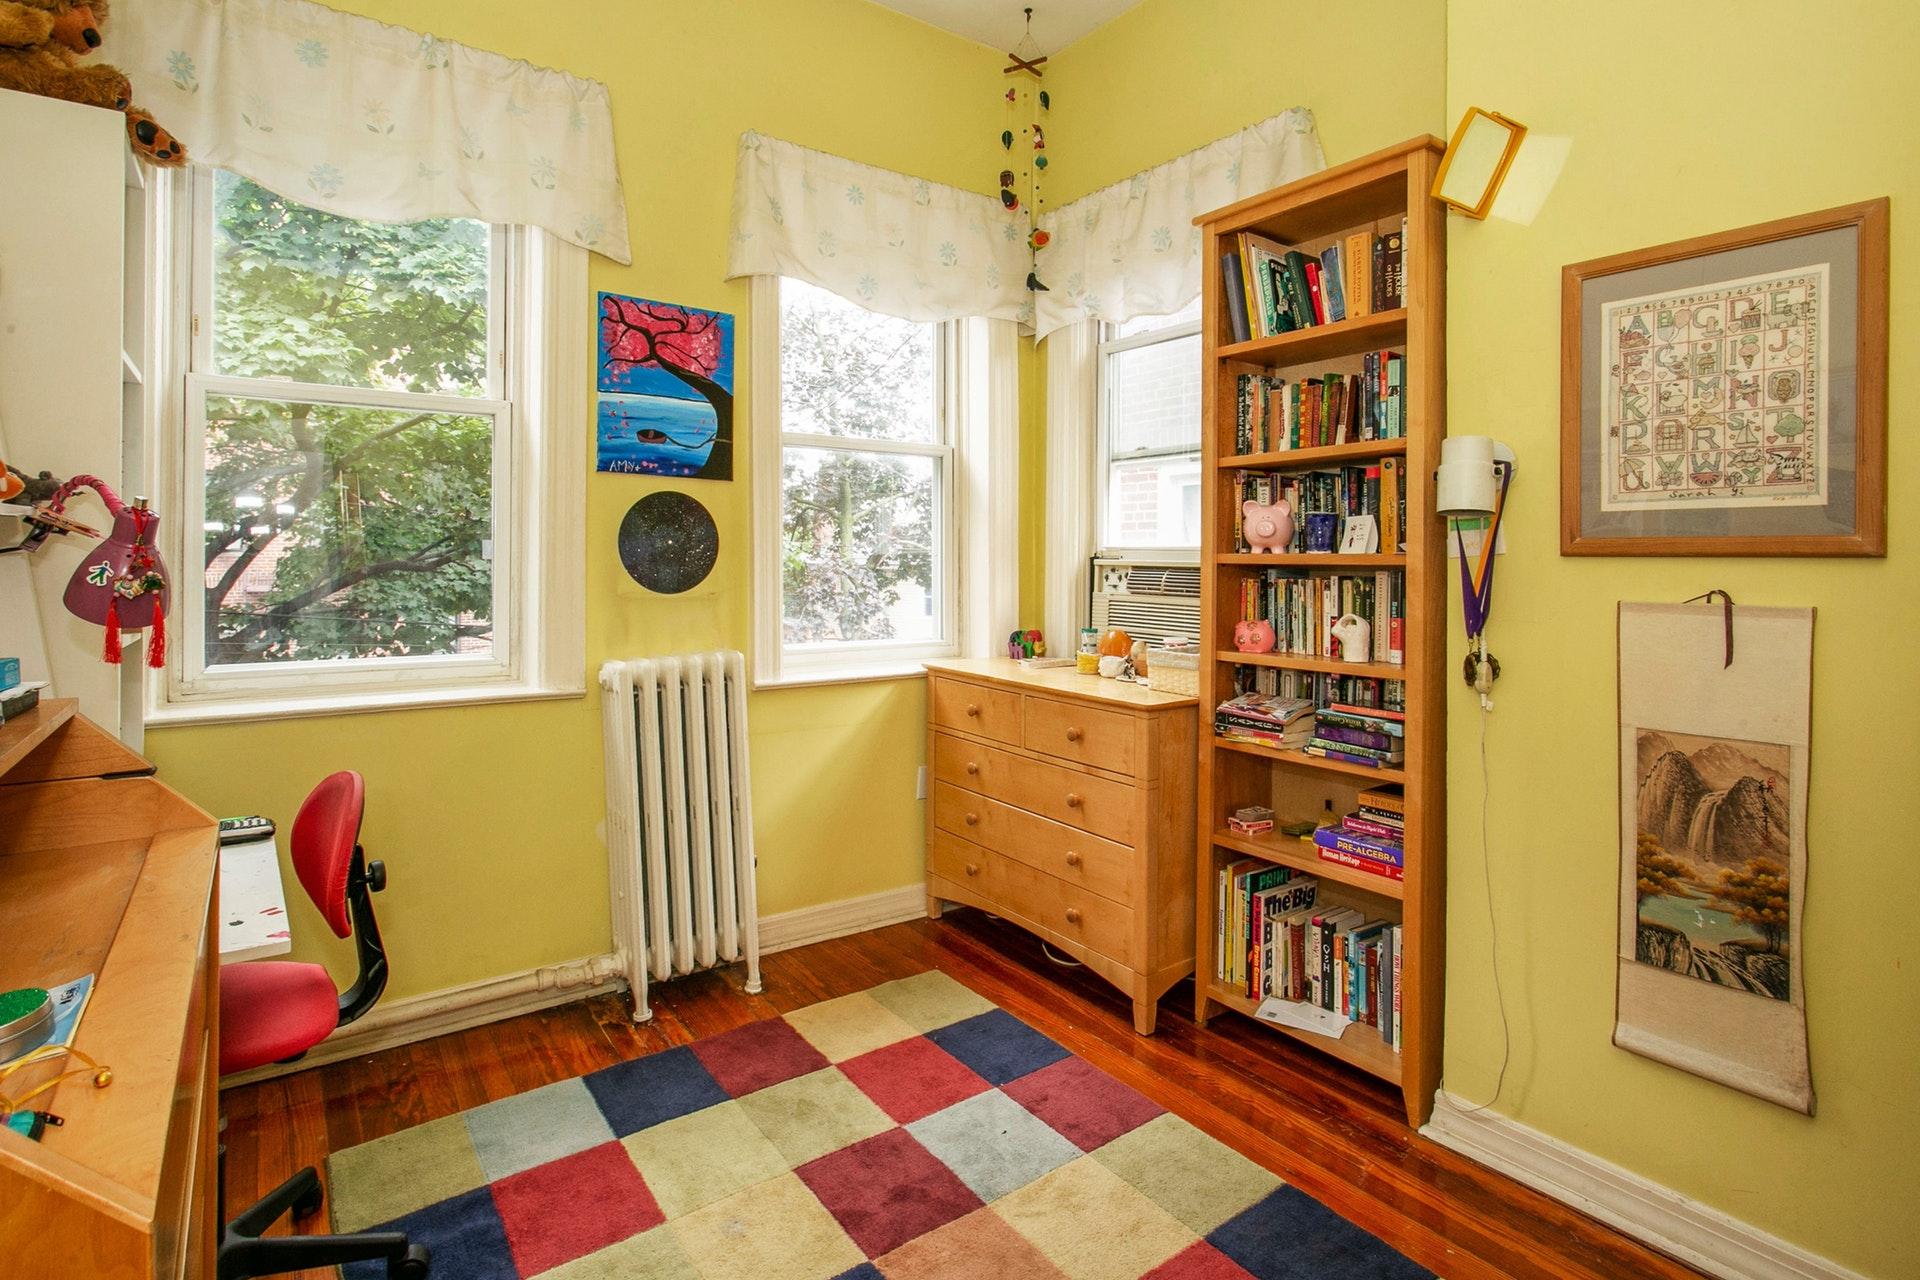 4-Bd. Brick House w/ High Ceilings, Charming Deck & 2-Car Garage